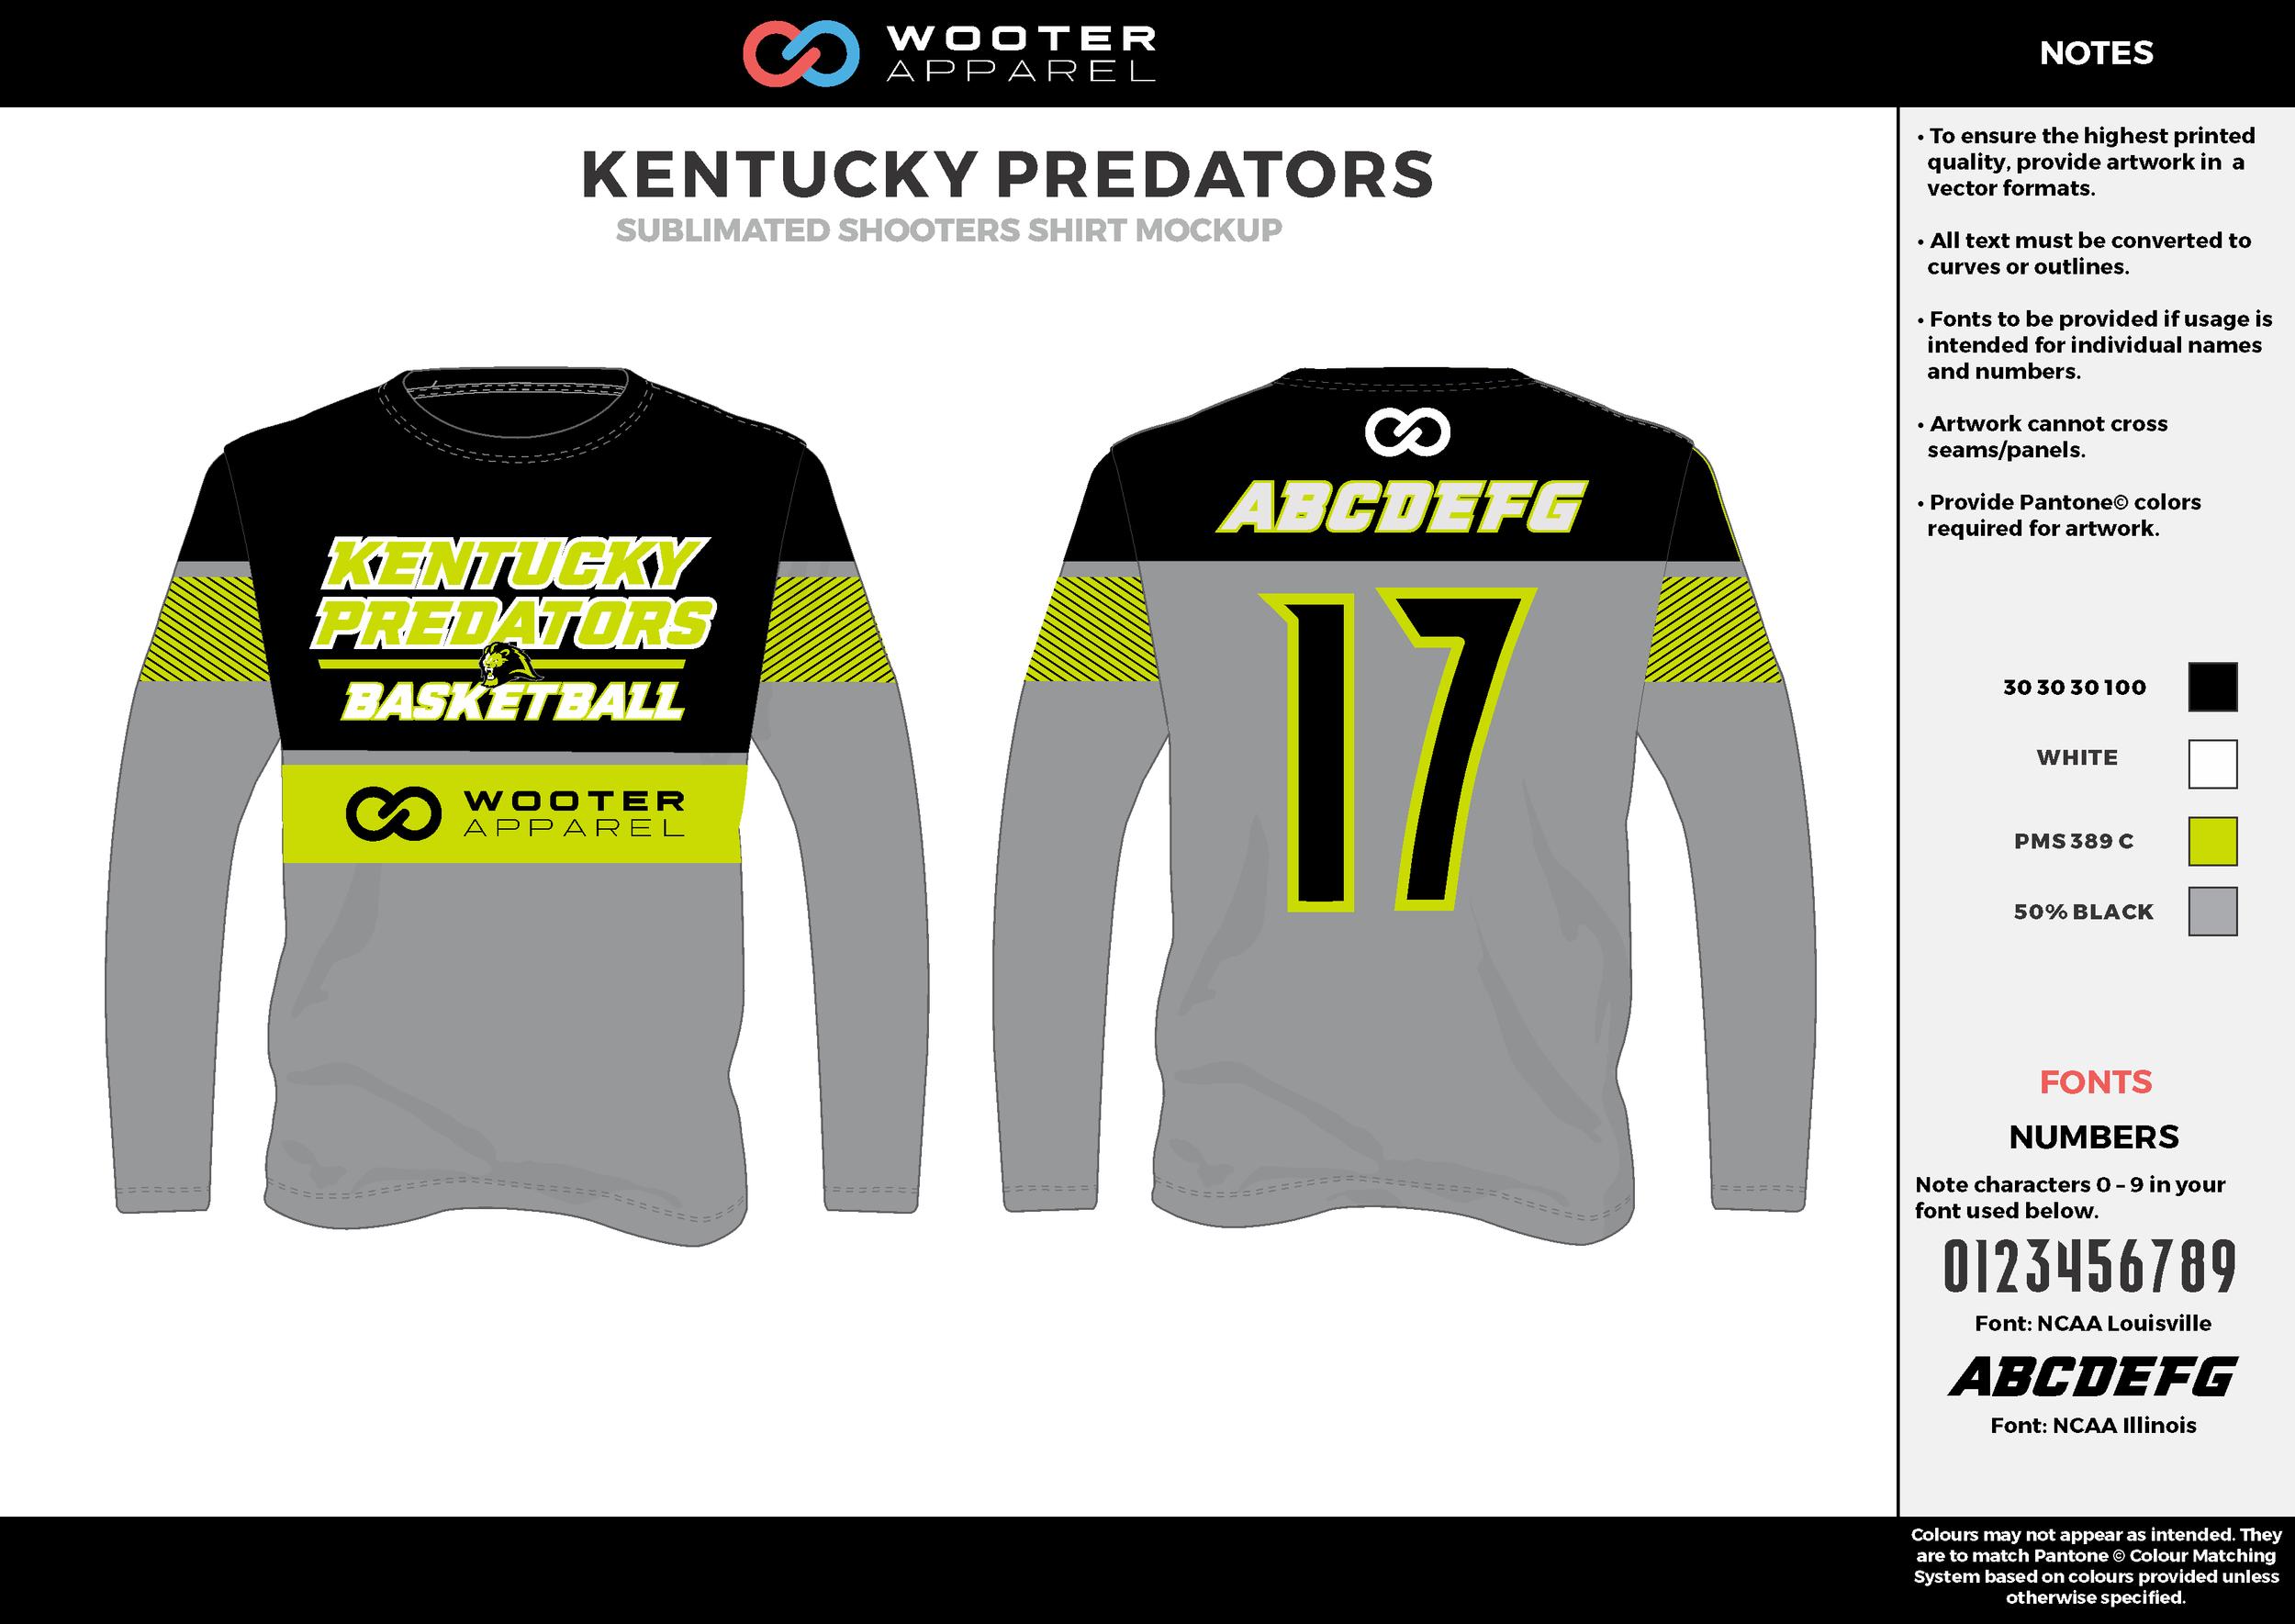 KENTUCKY PREDATORS gray black yellow white Basketball Long Sleeve Shooting Shirt